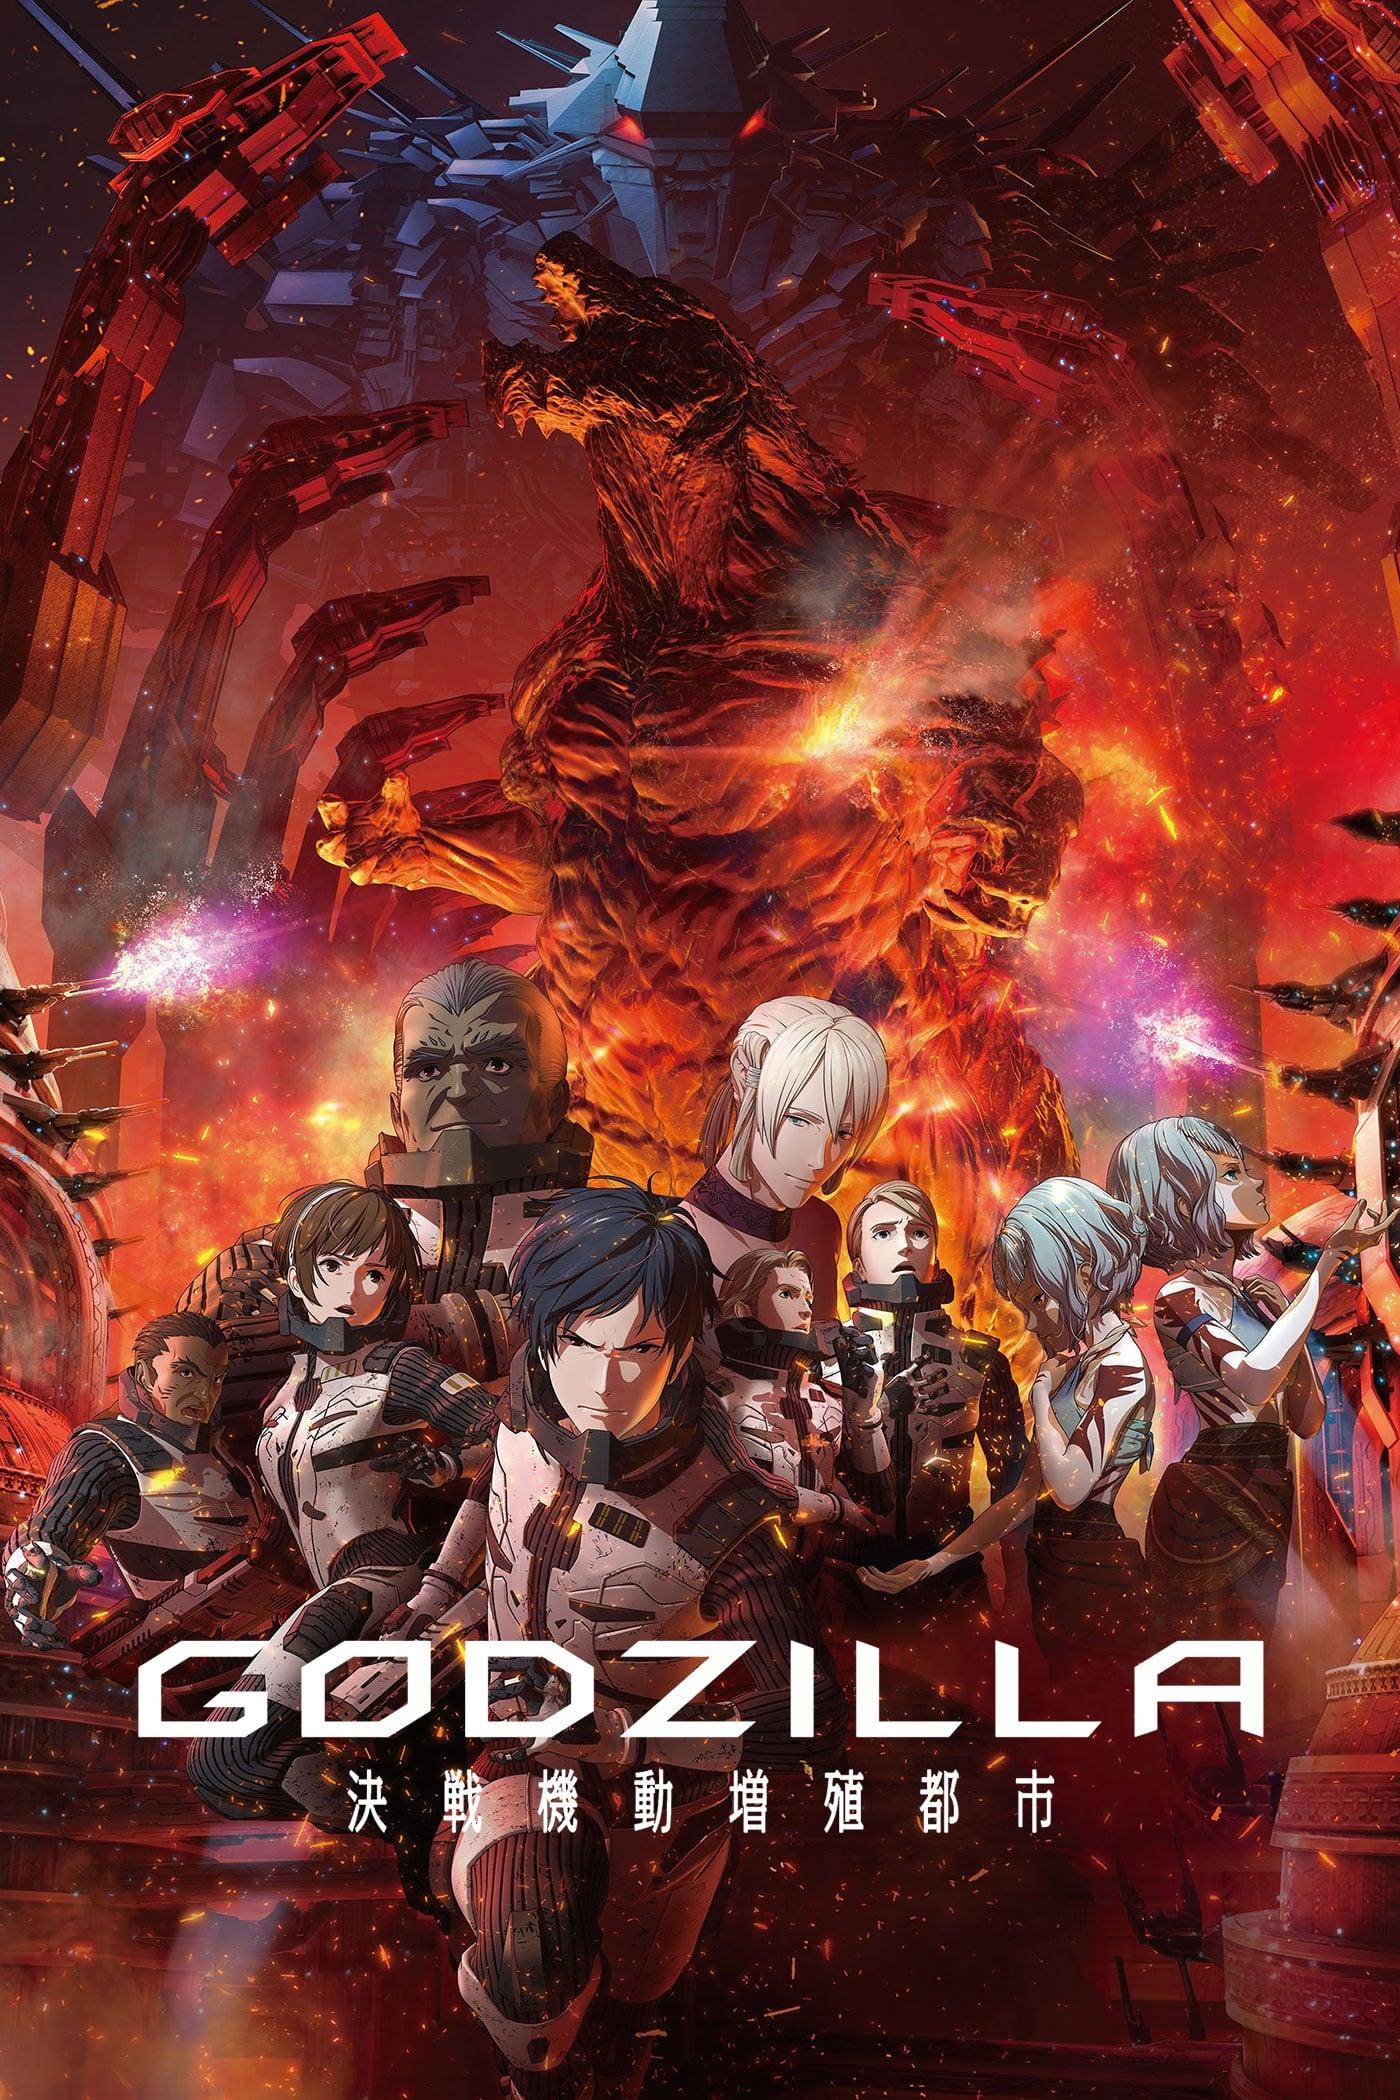 Godzilla: Thành Phố Chiến - Godzilla: City on the Edge of Battle (2018)